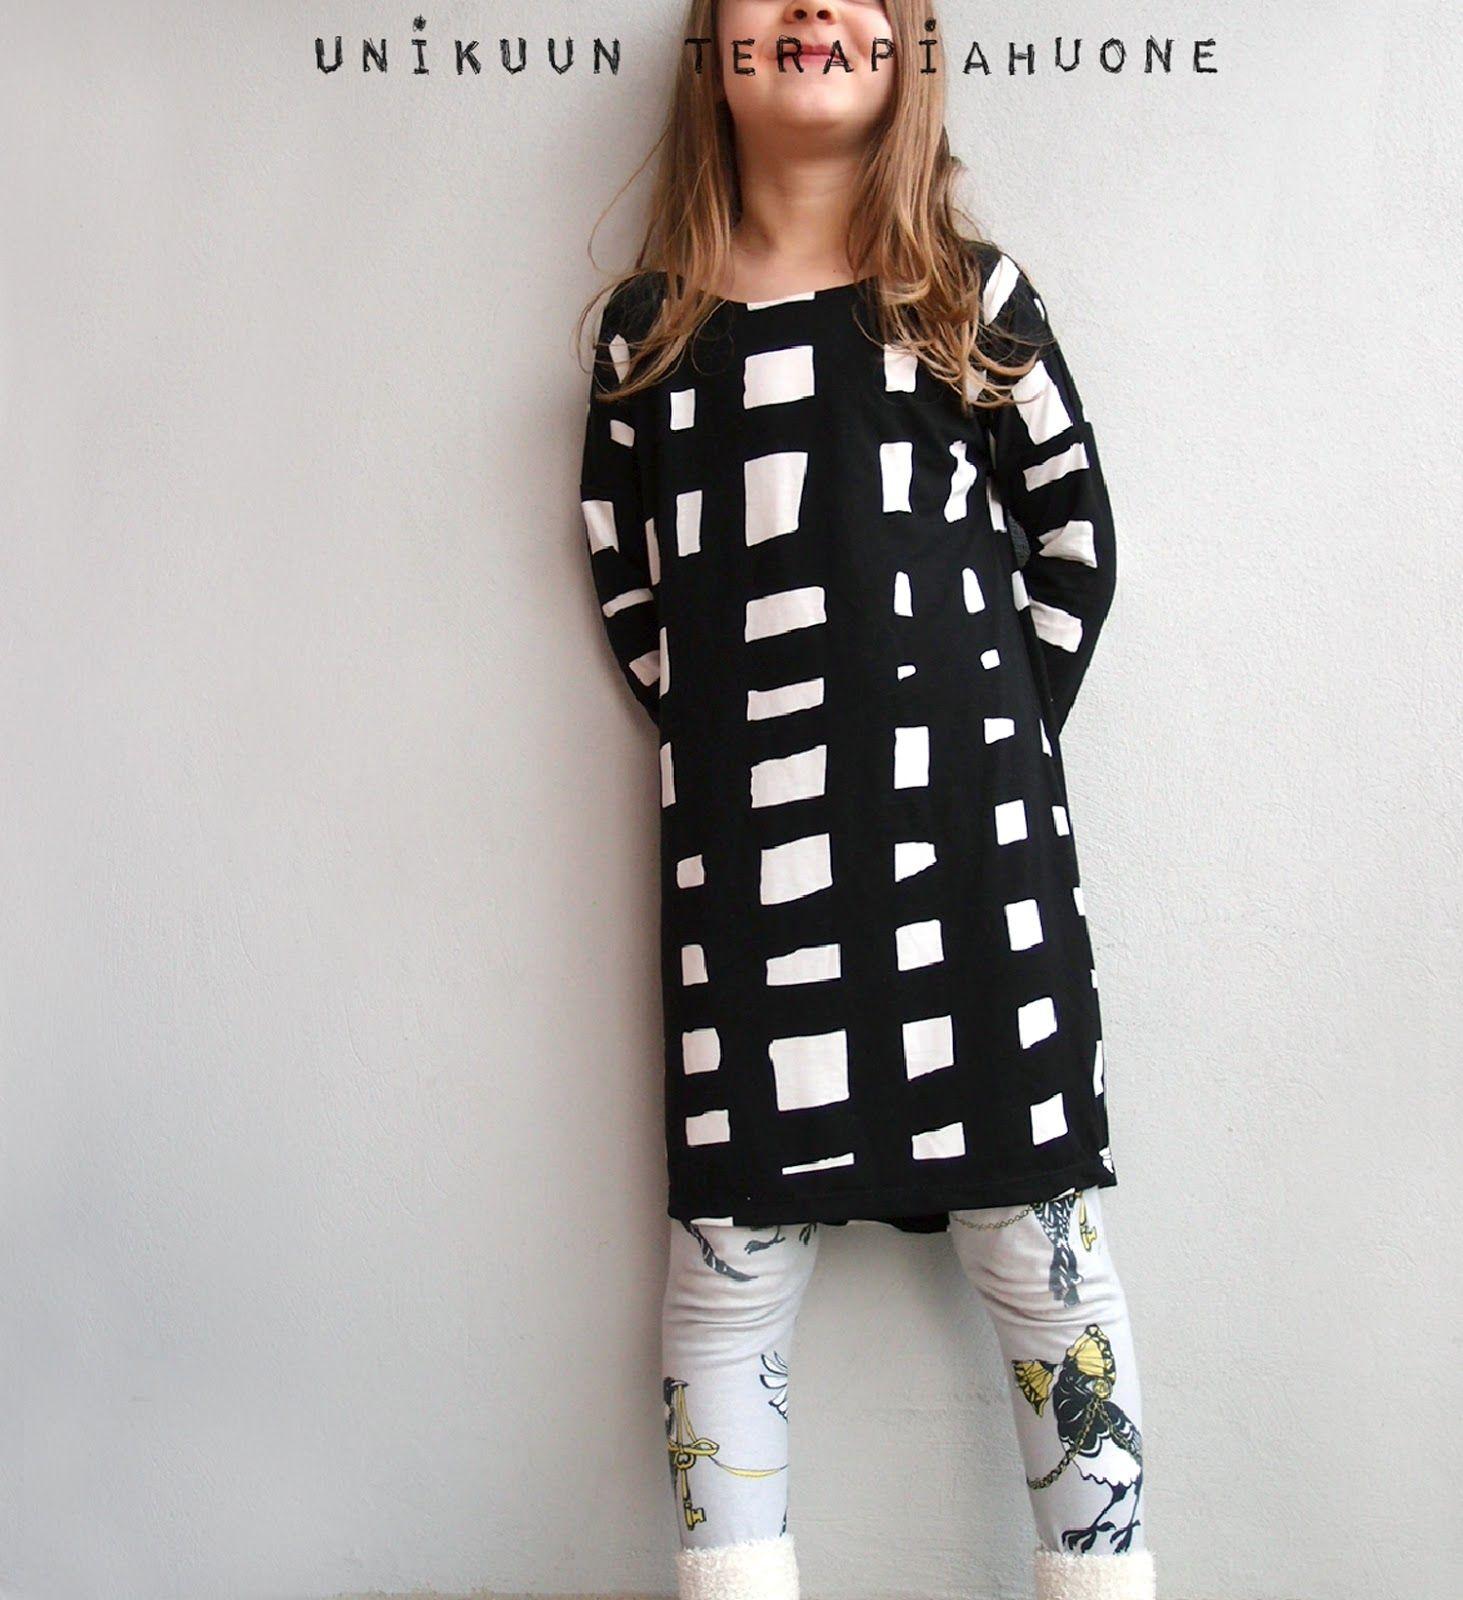 Black and white dress sewed by Unikuun terapiahuone. Fabric is from Marimekko.